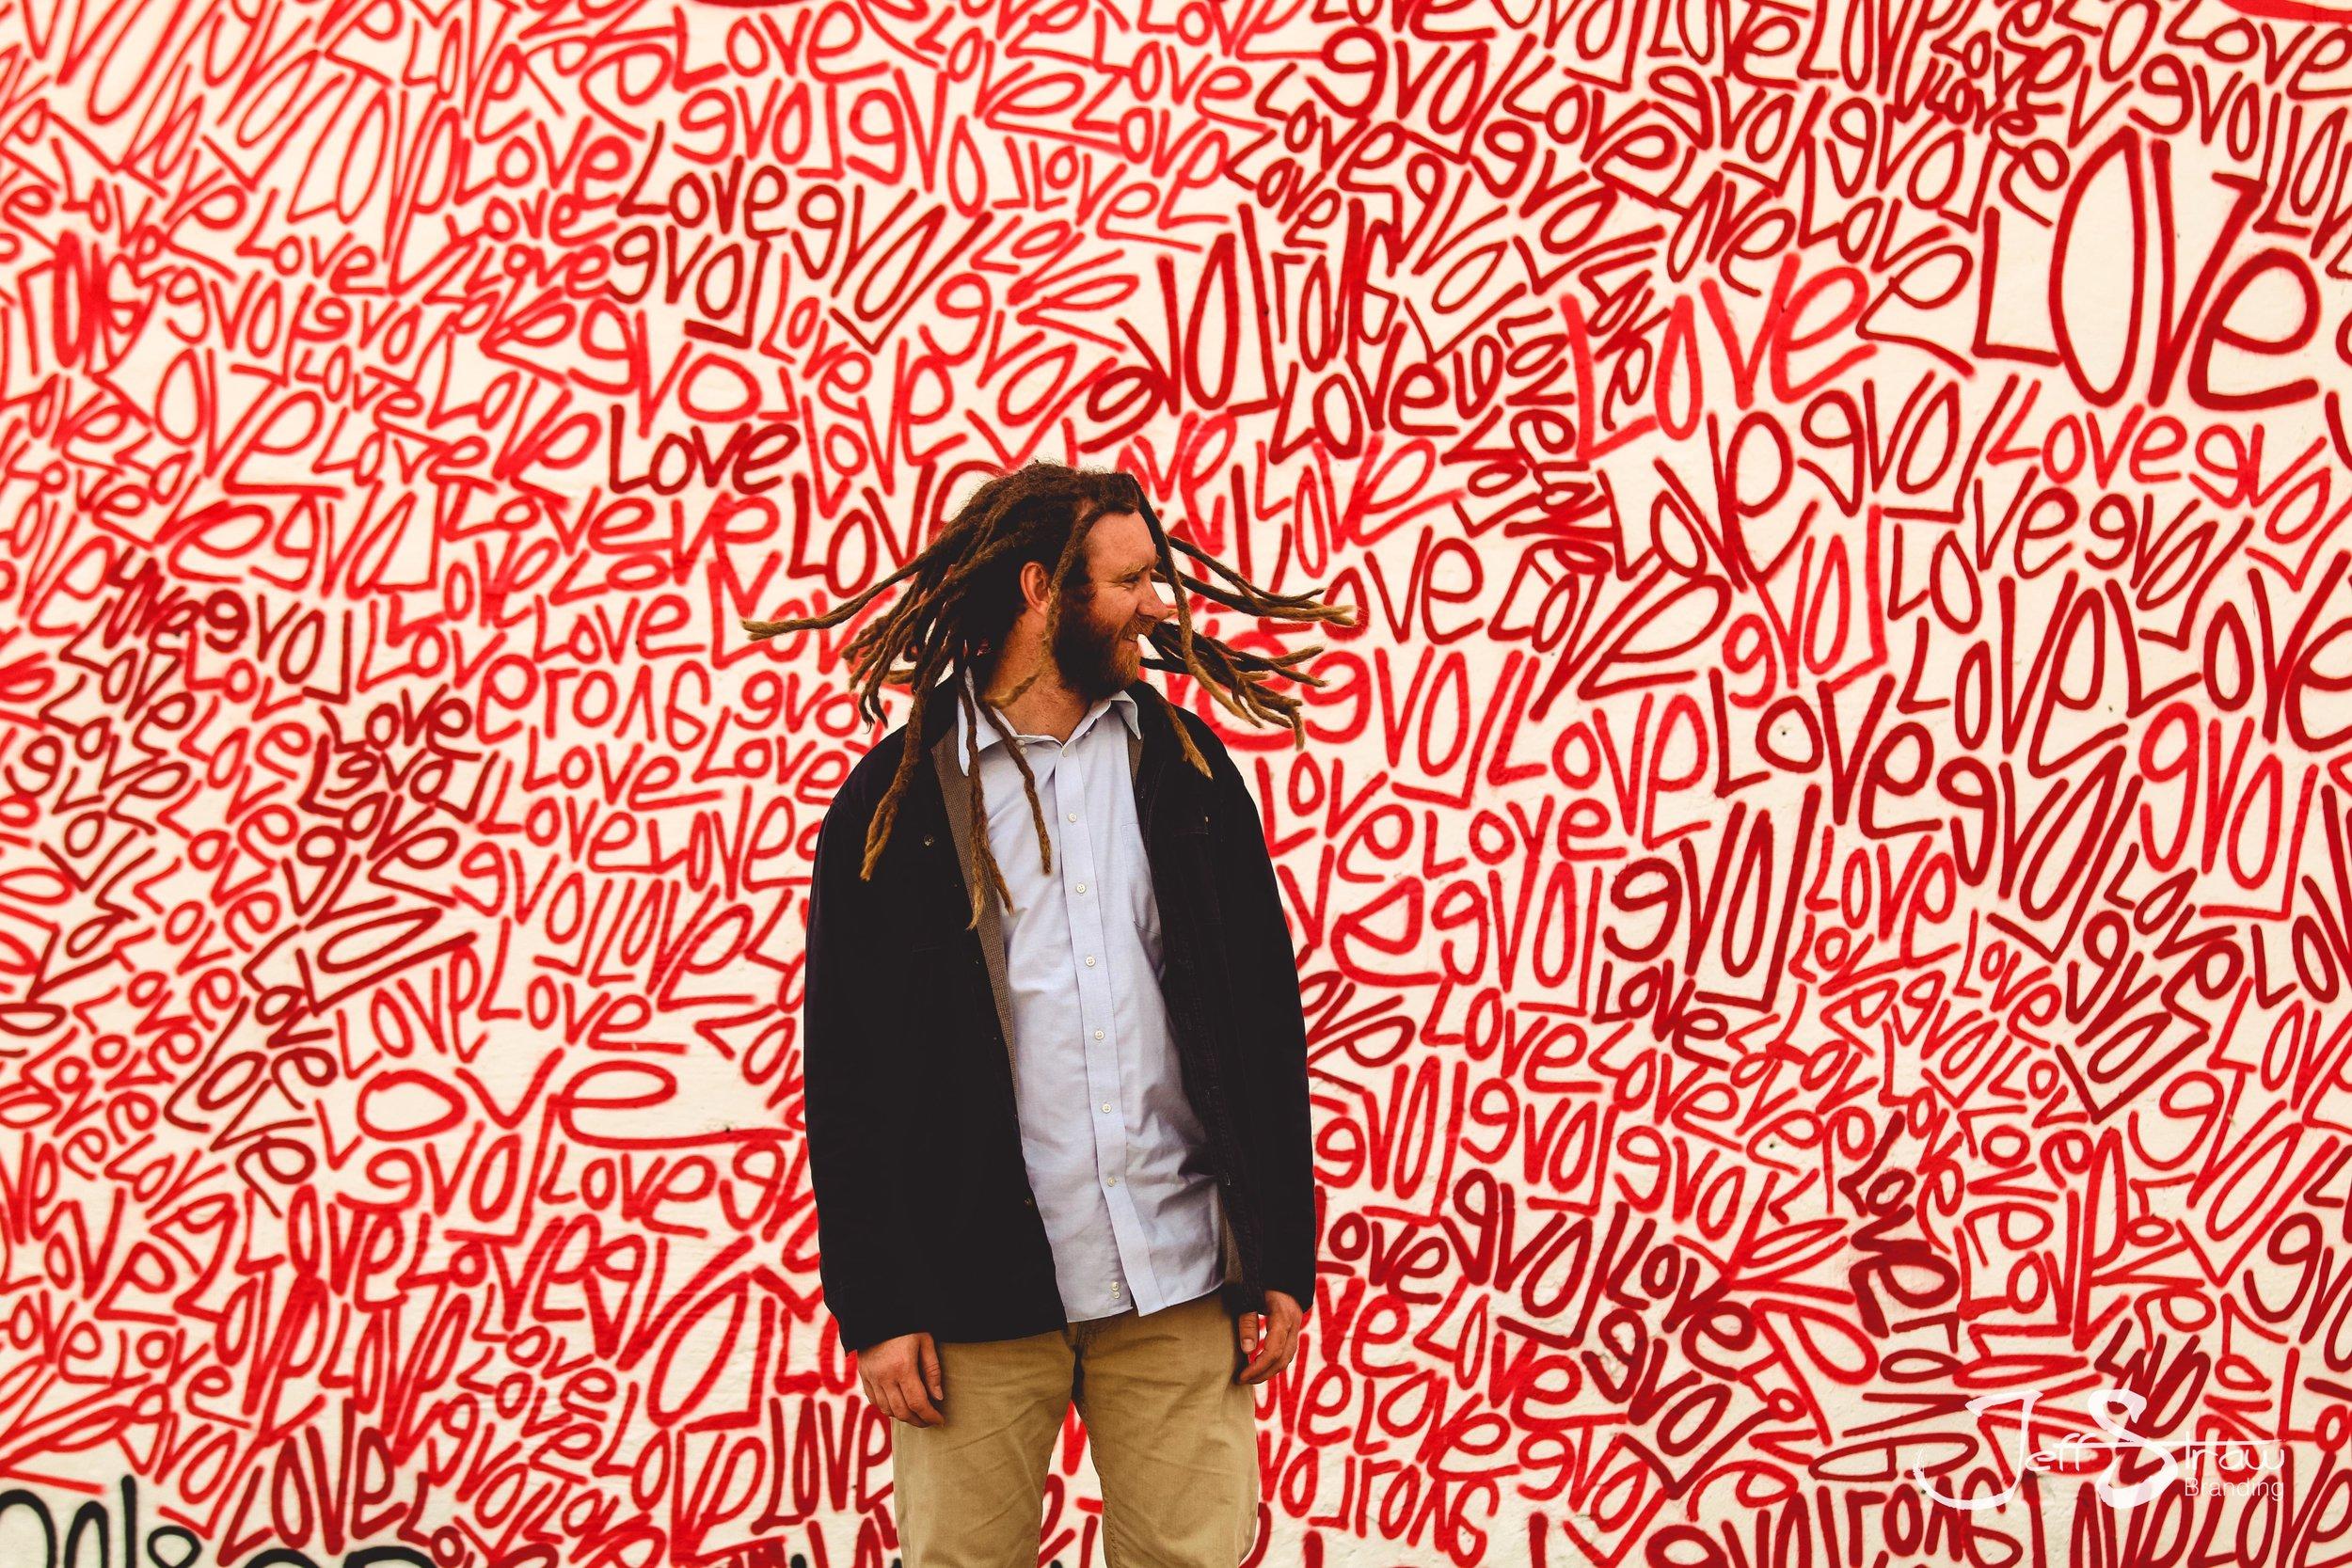 Jeremiah Tindall - Miami based reggae singer and songwriter - Press Photos